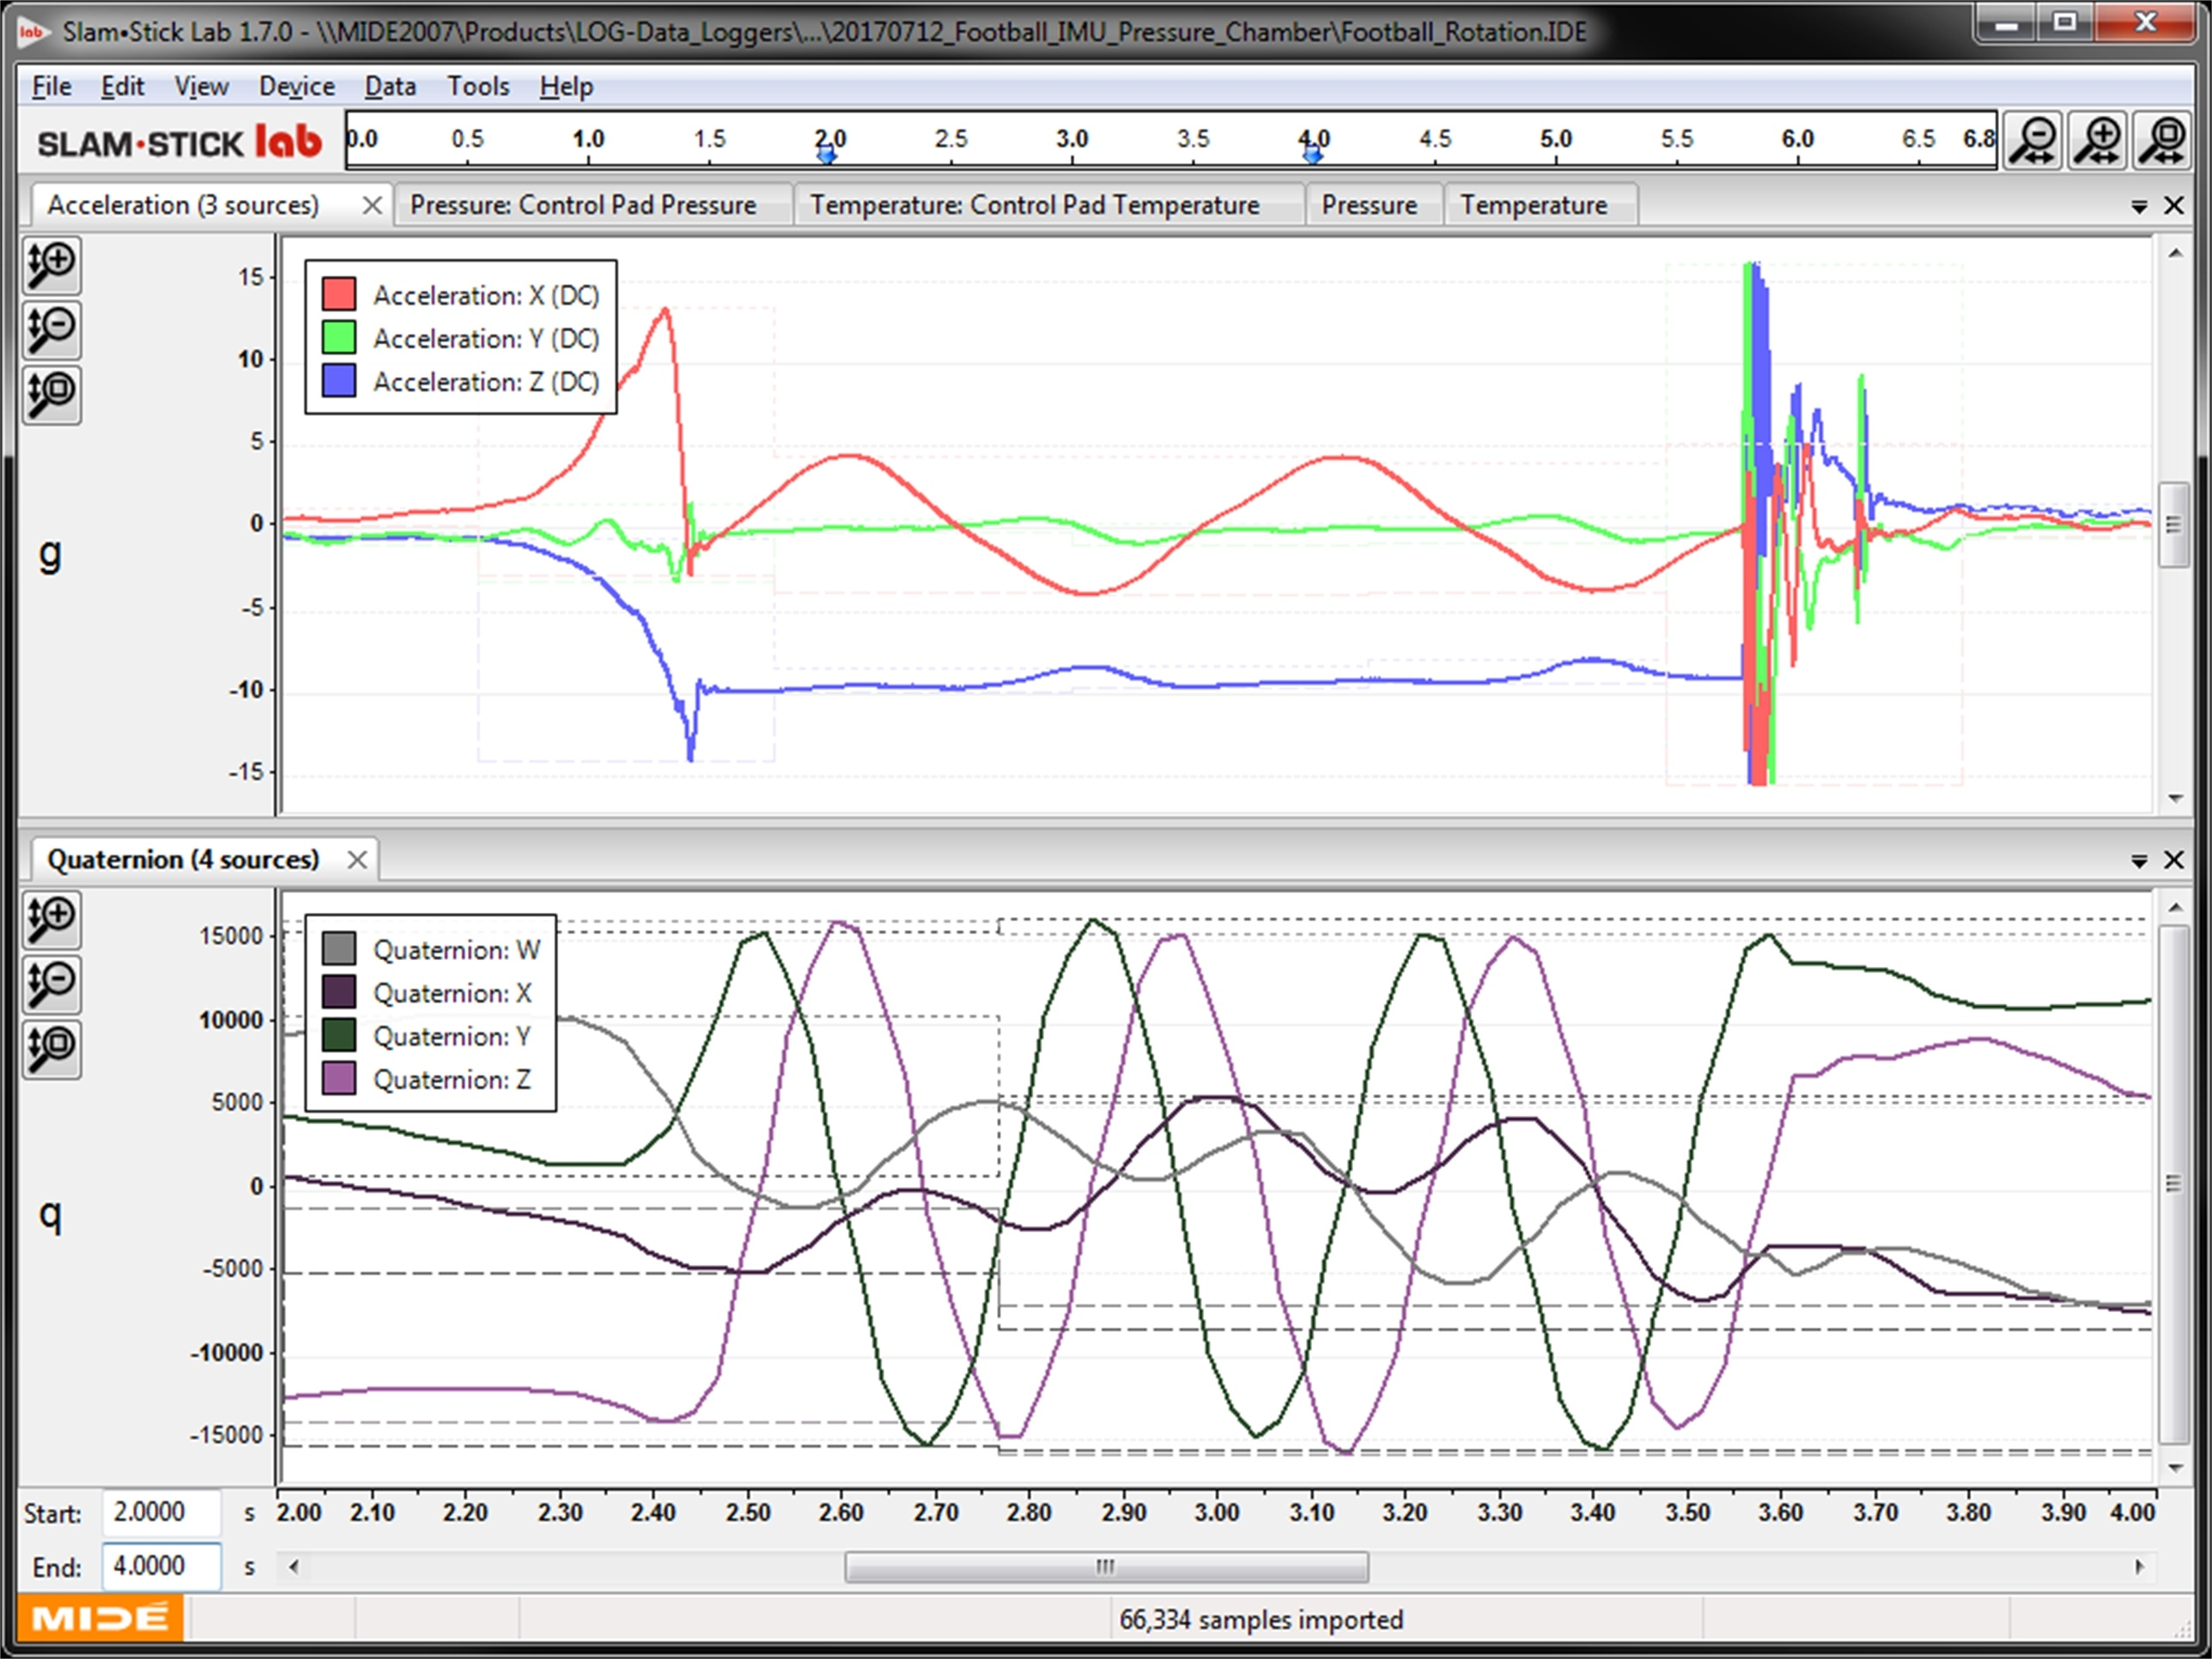 Quaternion-acceleration-football-rotation